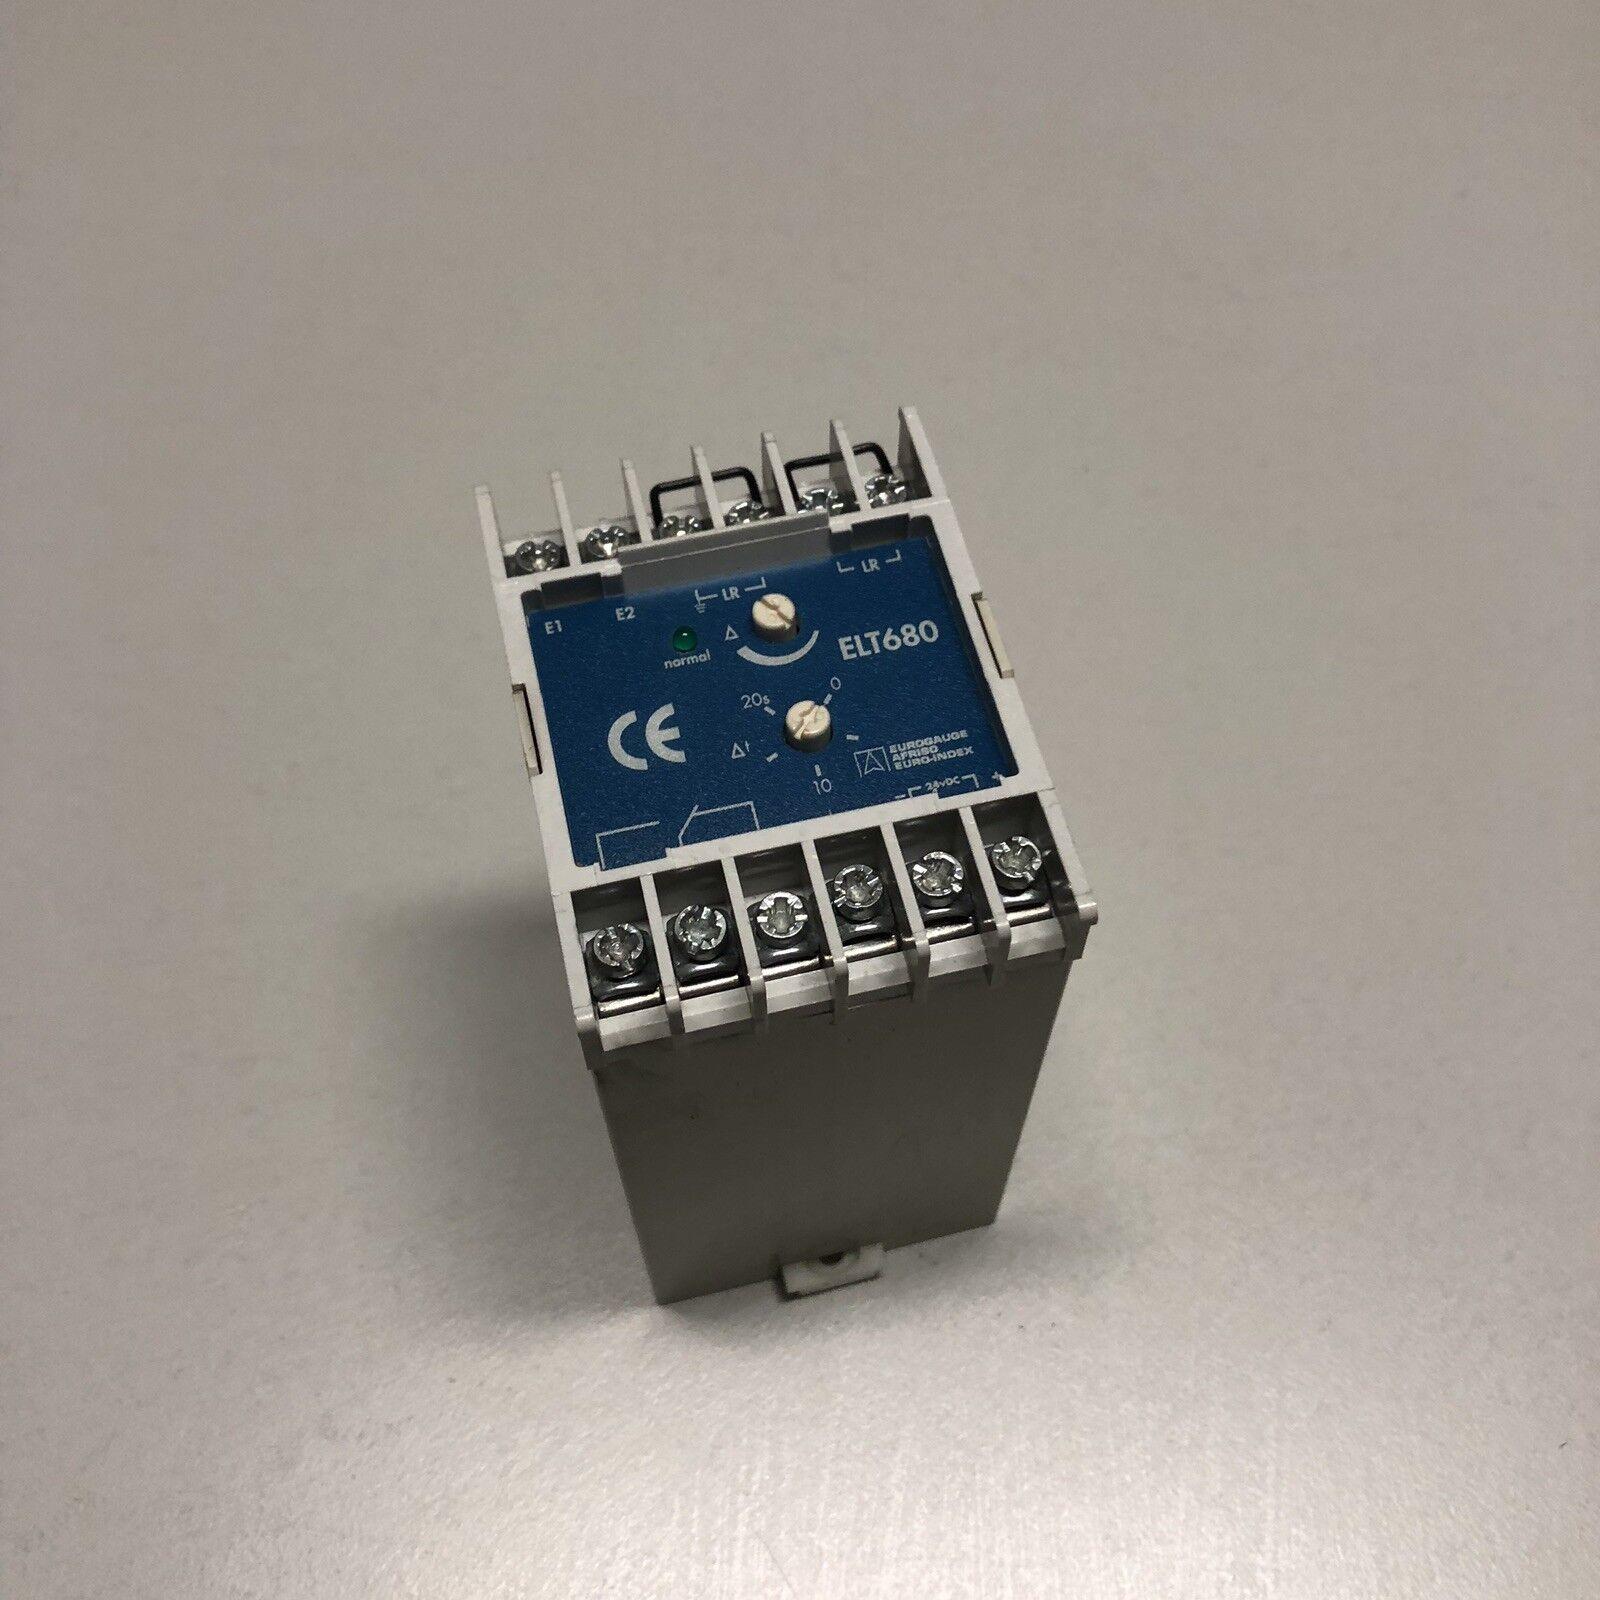 Eurogauge   ELT 680   Conductivity Level Switch + Timer